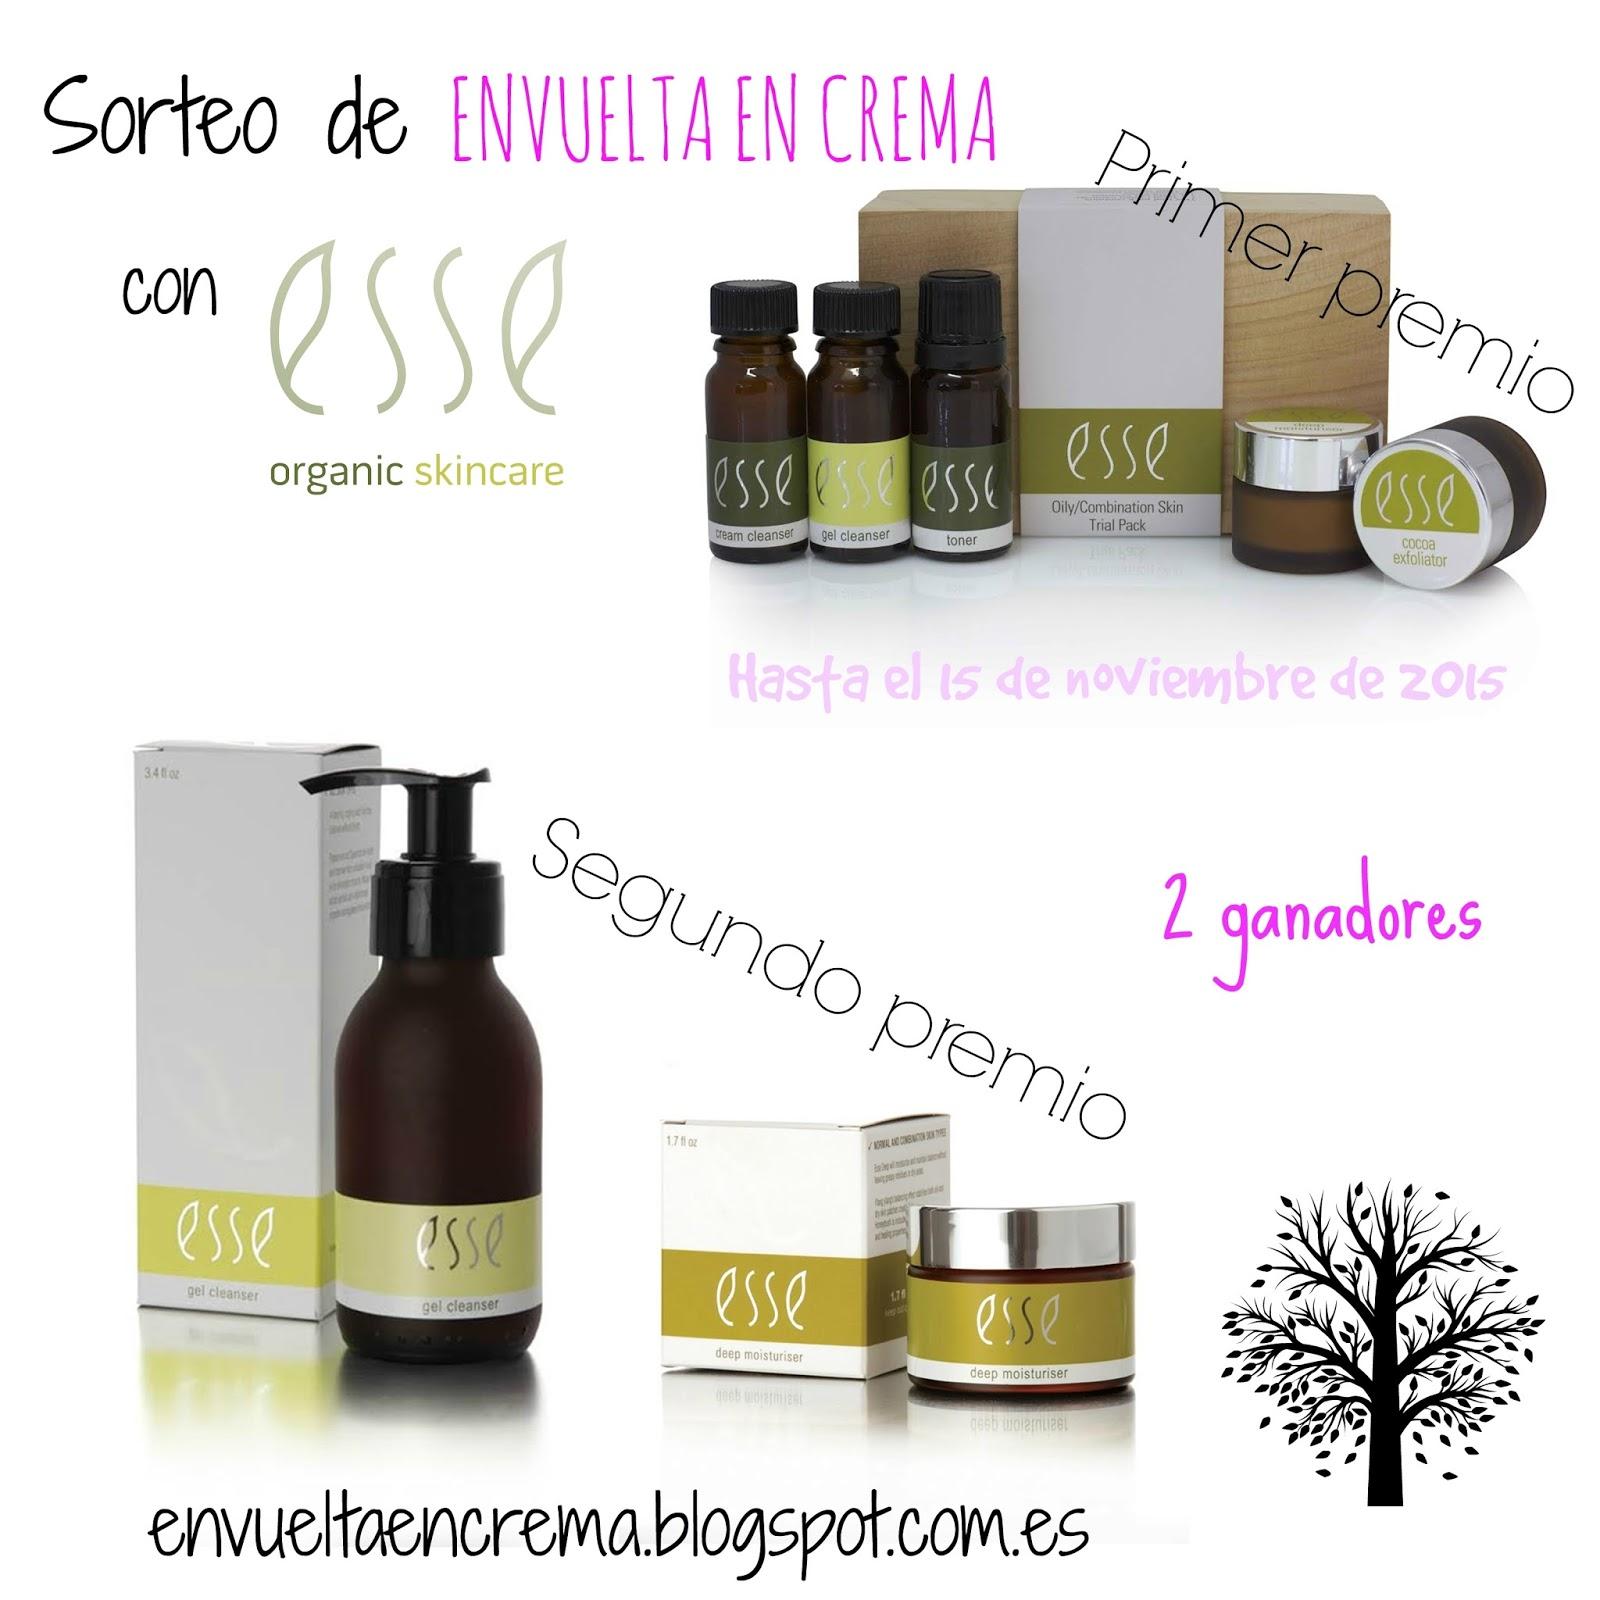 http://envueltaencrema.blogspot.com.es/2015/10/iii-aniversario-de-envuelta-en-crema_18.html